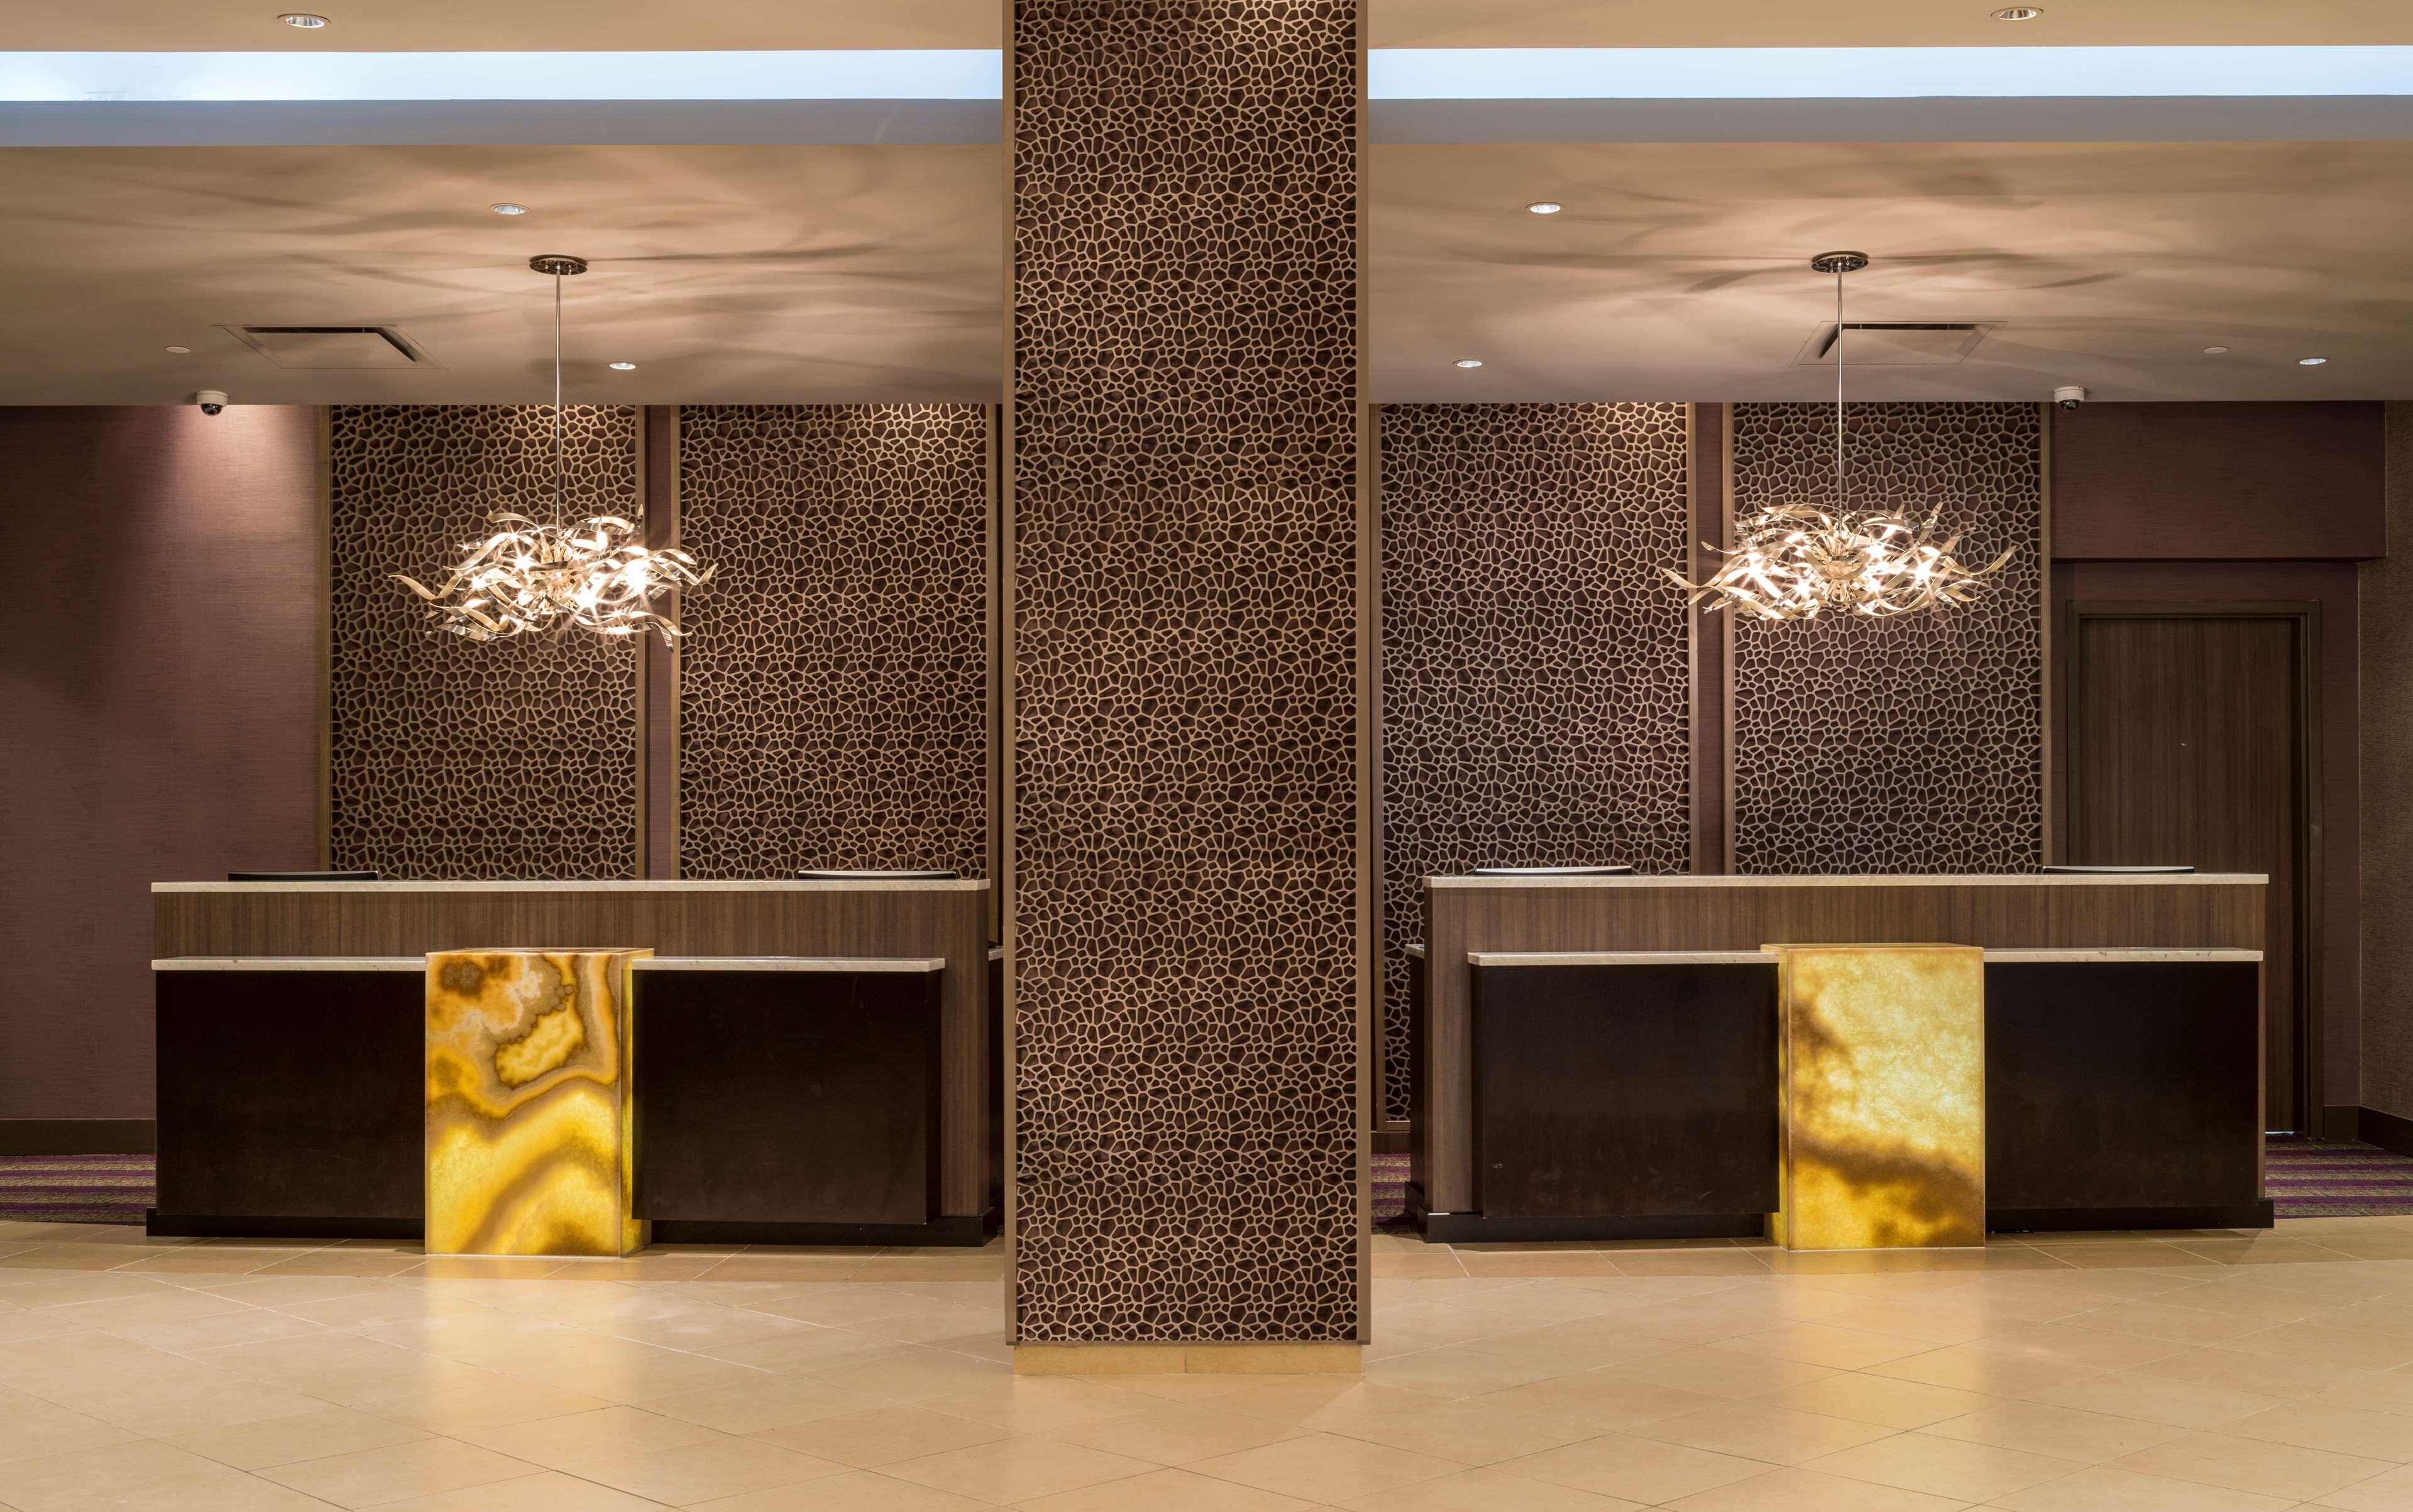 Hilton Washington DC/Rockville Hotel & Executive Meeting Ctr image 6